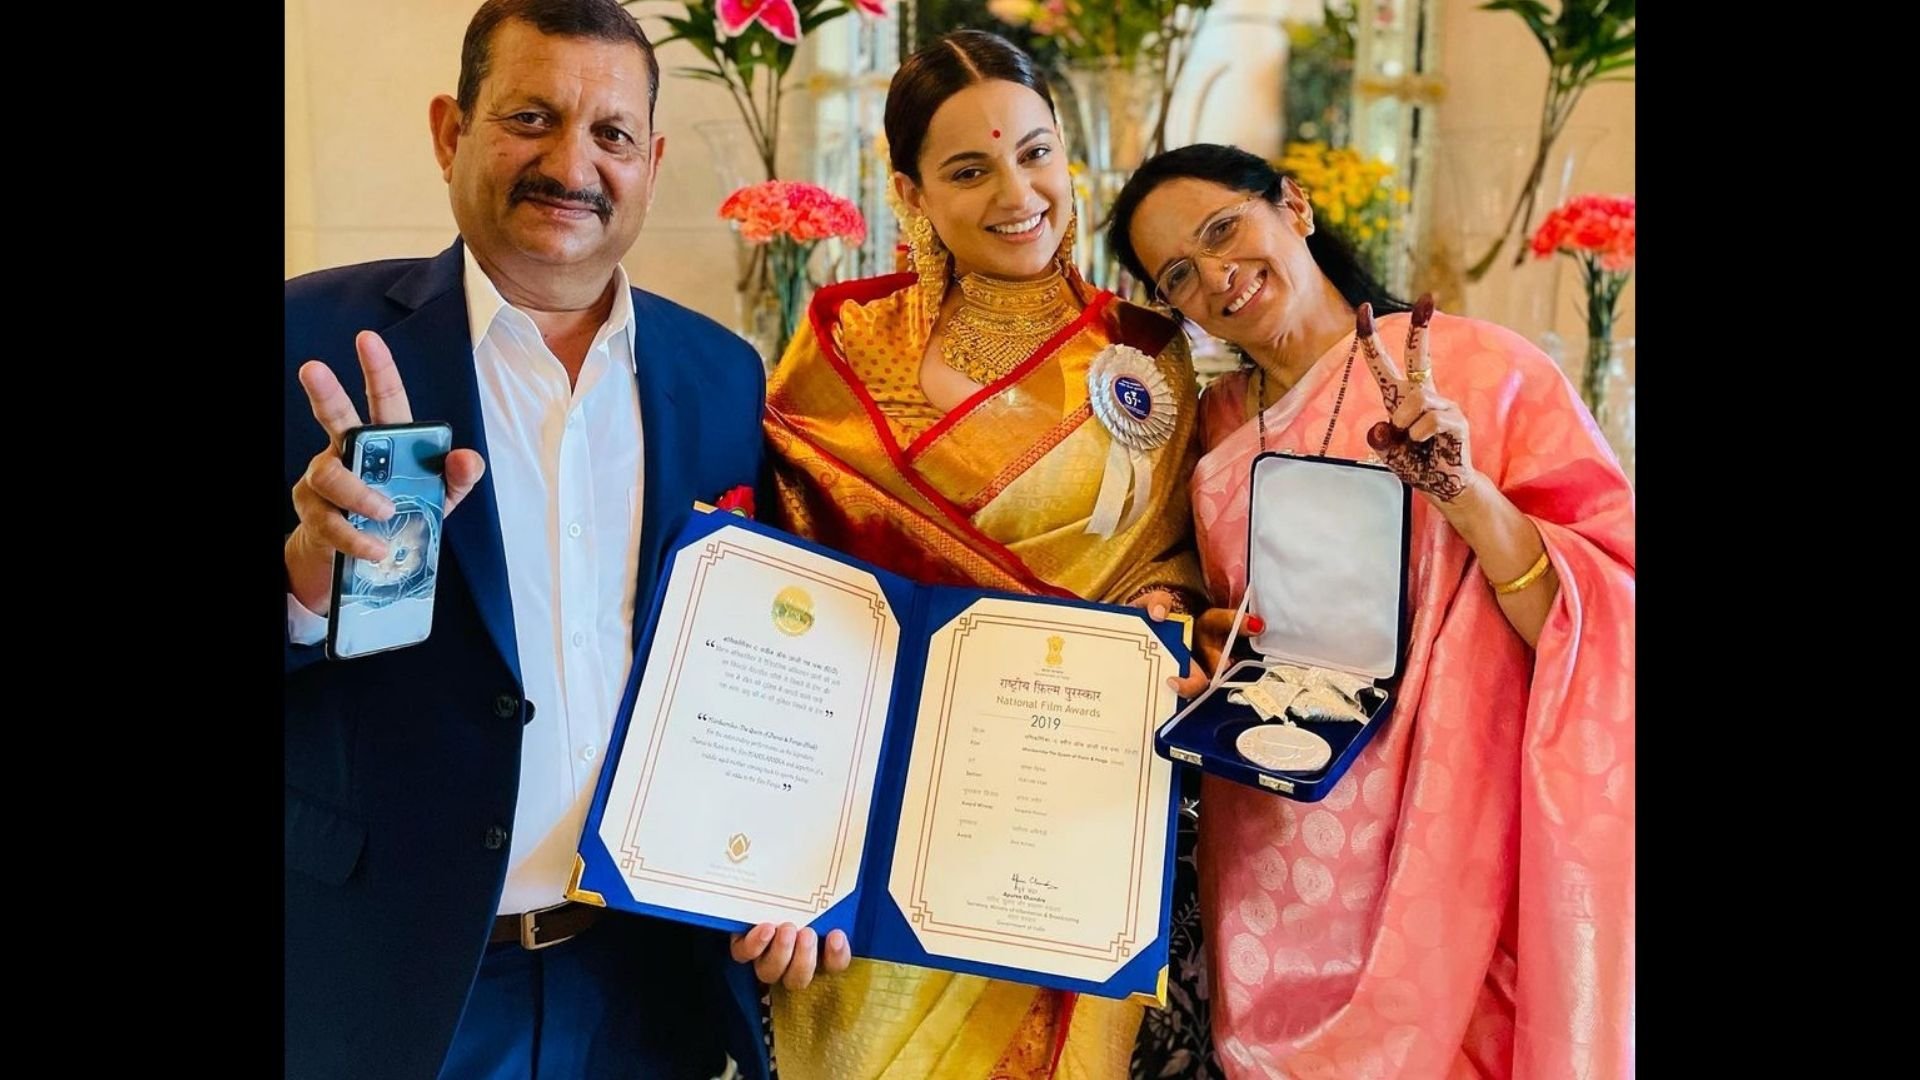 67th National Awards: Kangana Ranaut Recieves Her Fourth National Award For The Best Actress Title For Manikarnika And Panga